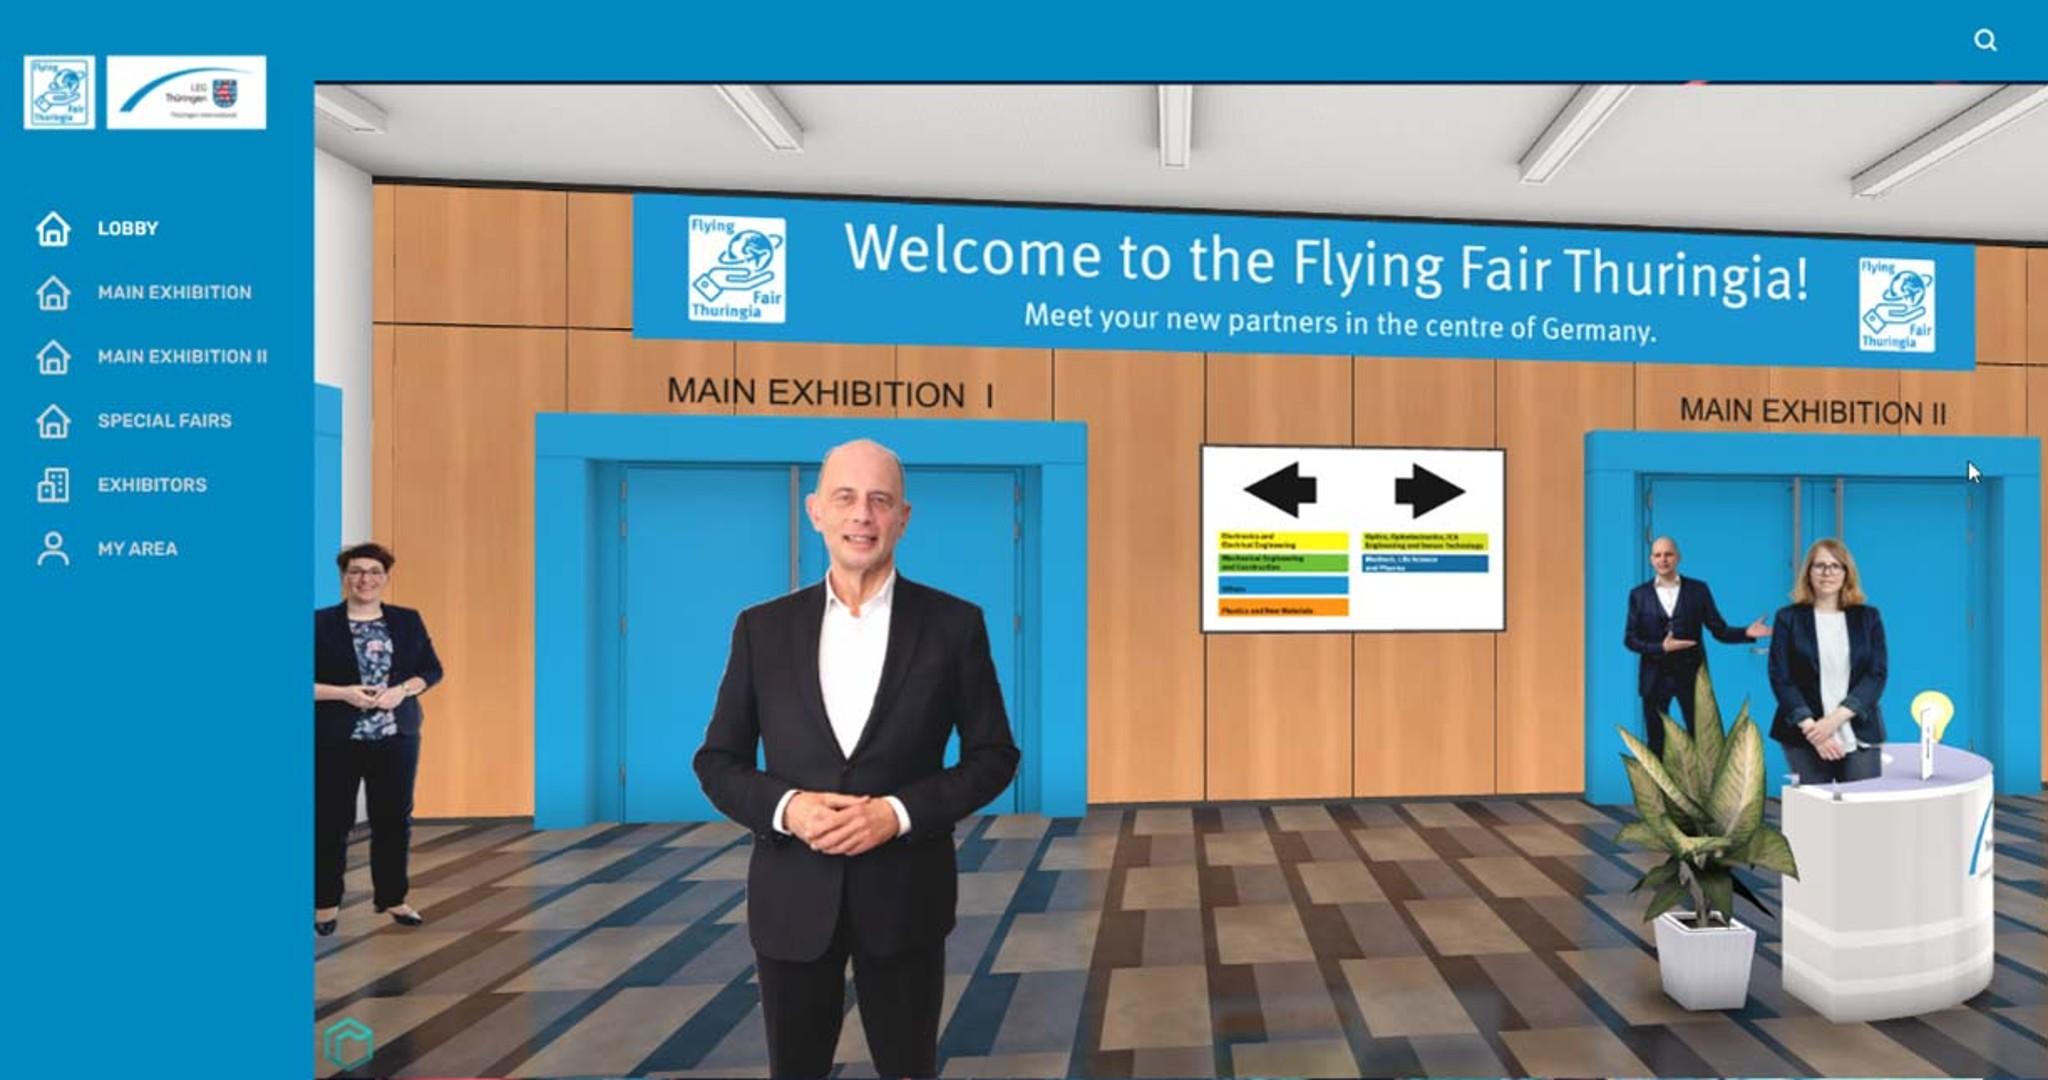 Entrance area of the virtual fair Flying Fair Thuringia